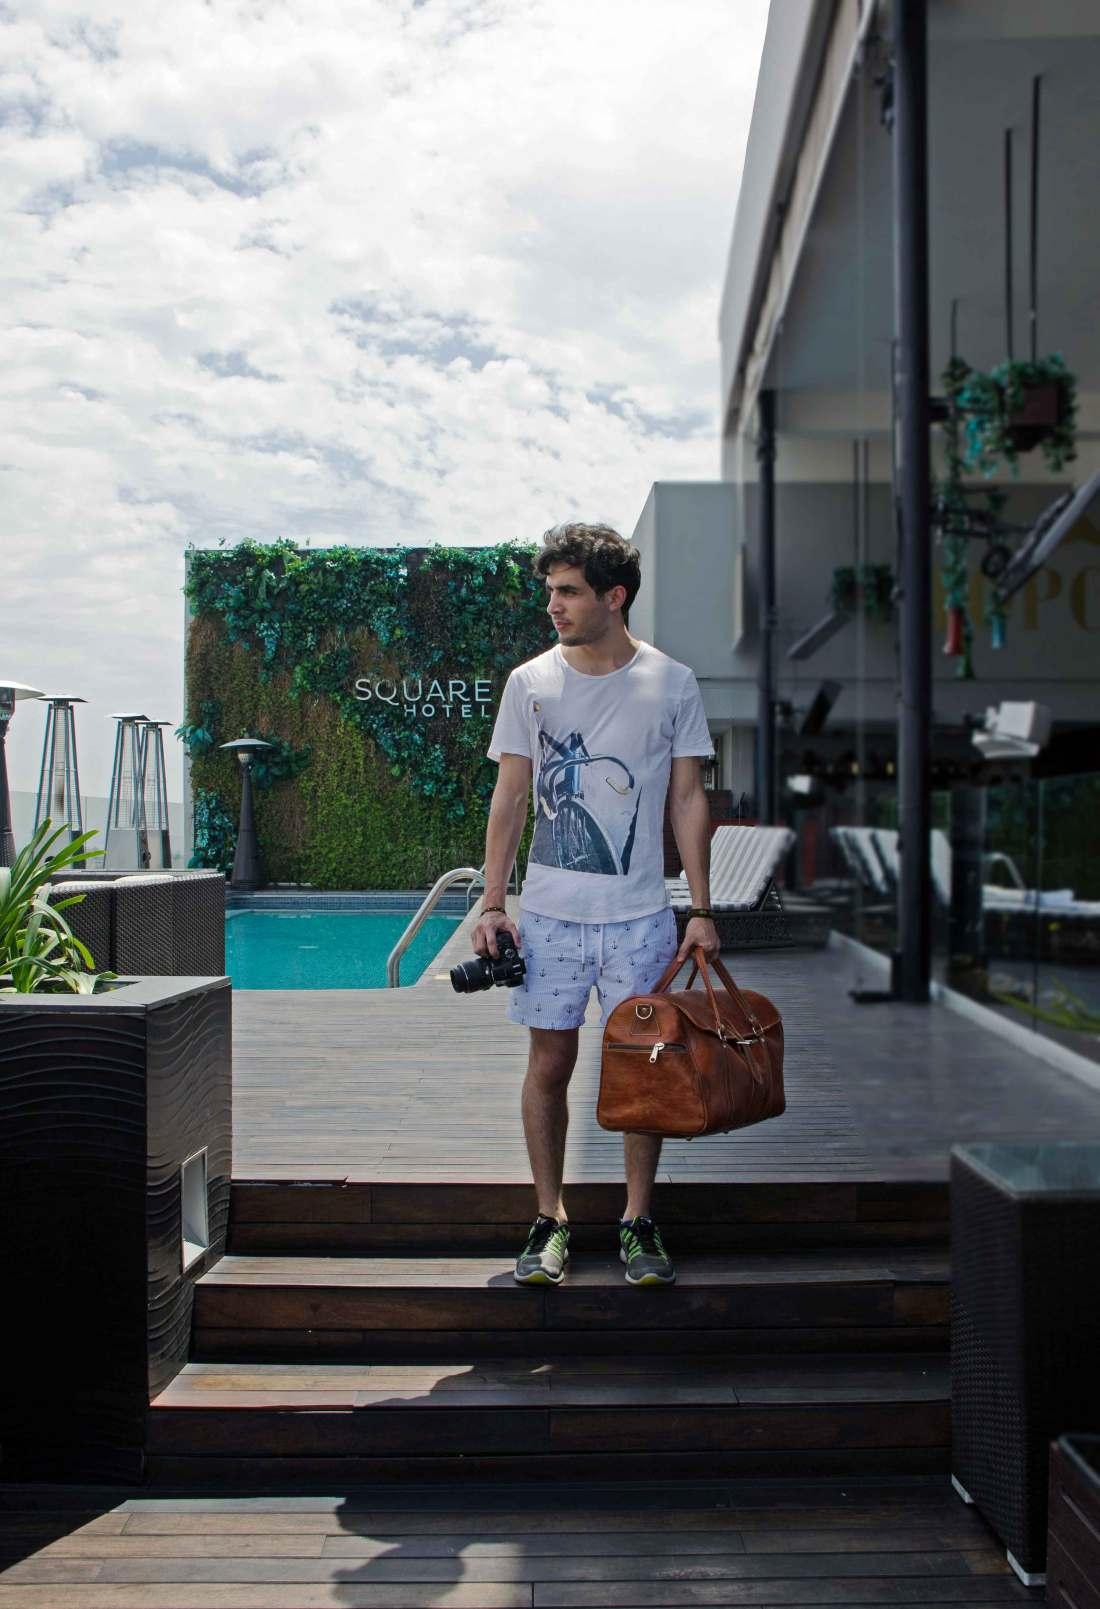 pose-Square-Hotel-Luxury-Guadalajara-alex-jumper-buena2